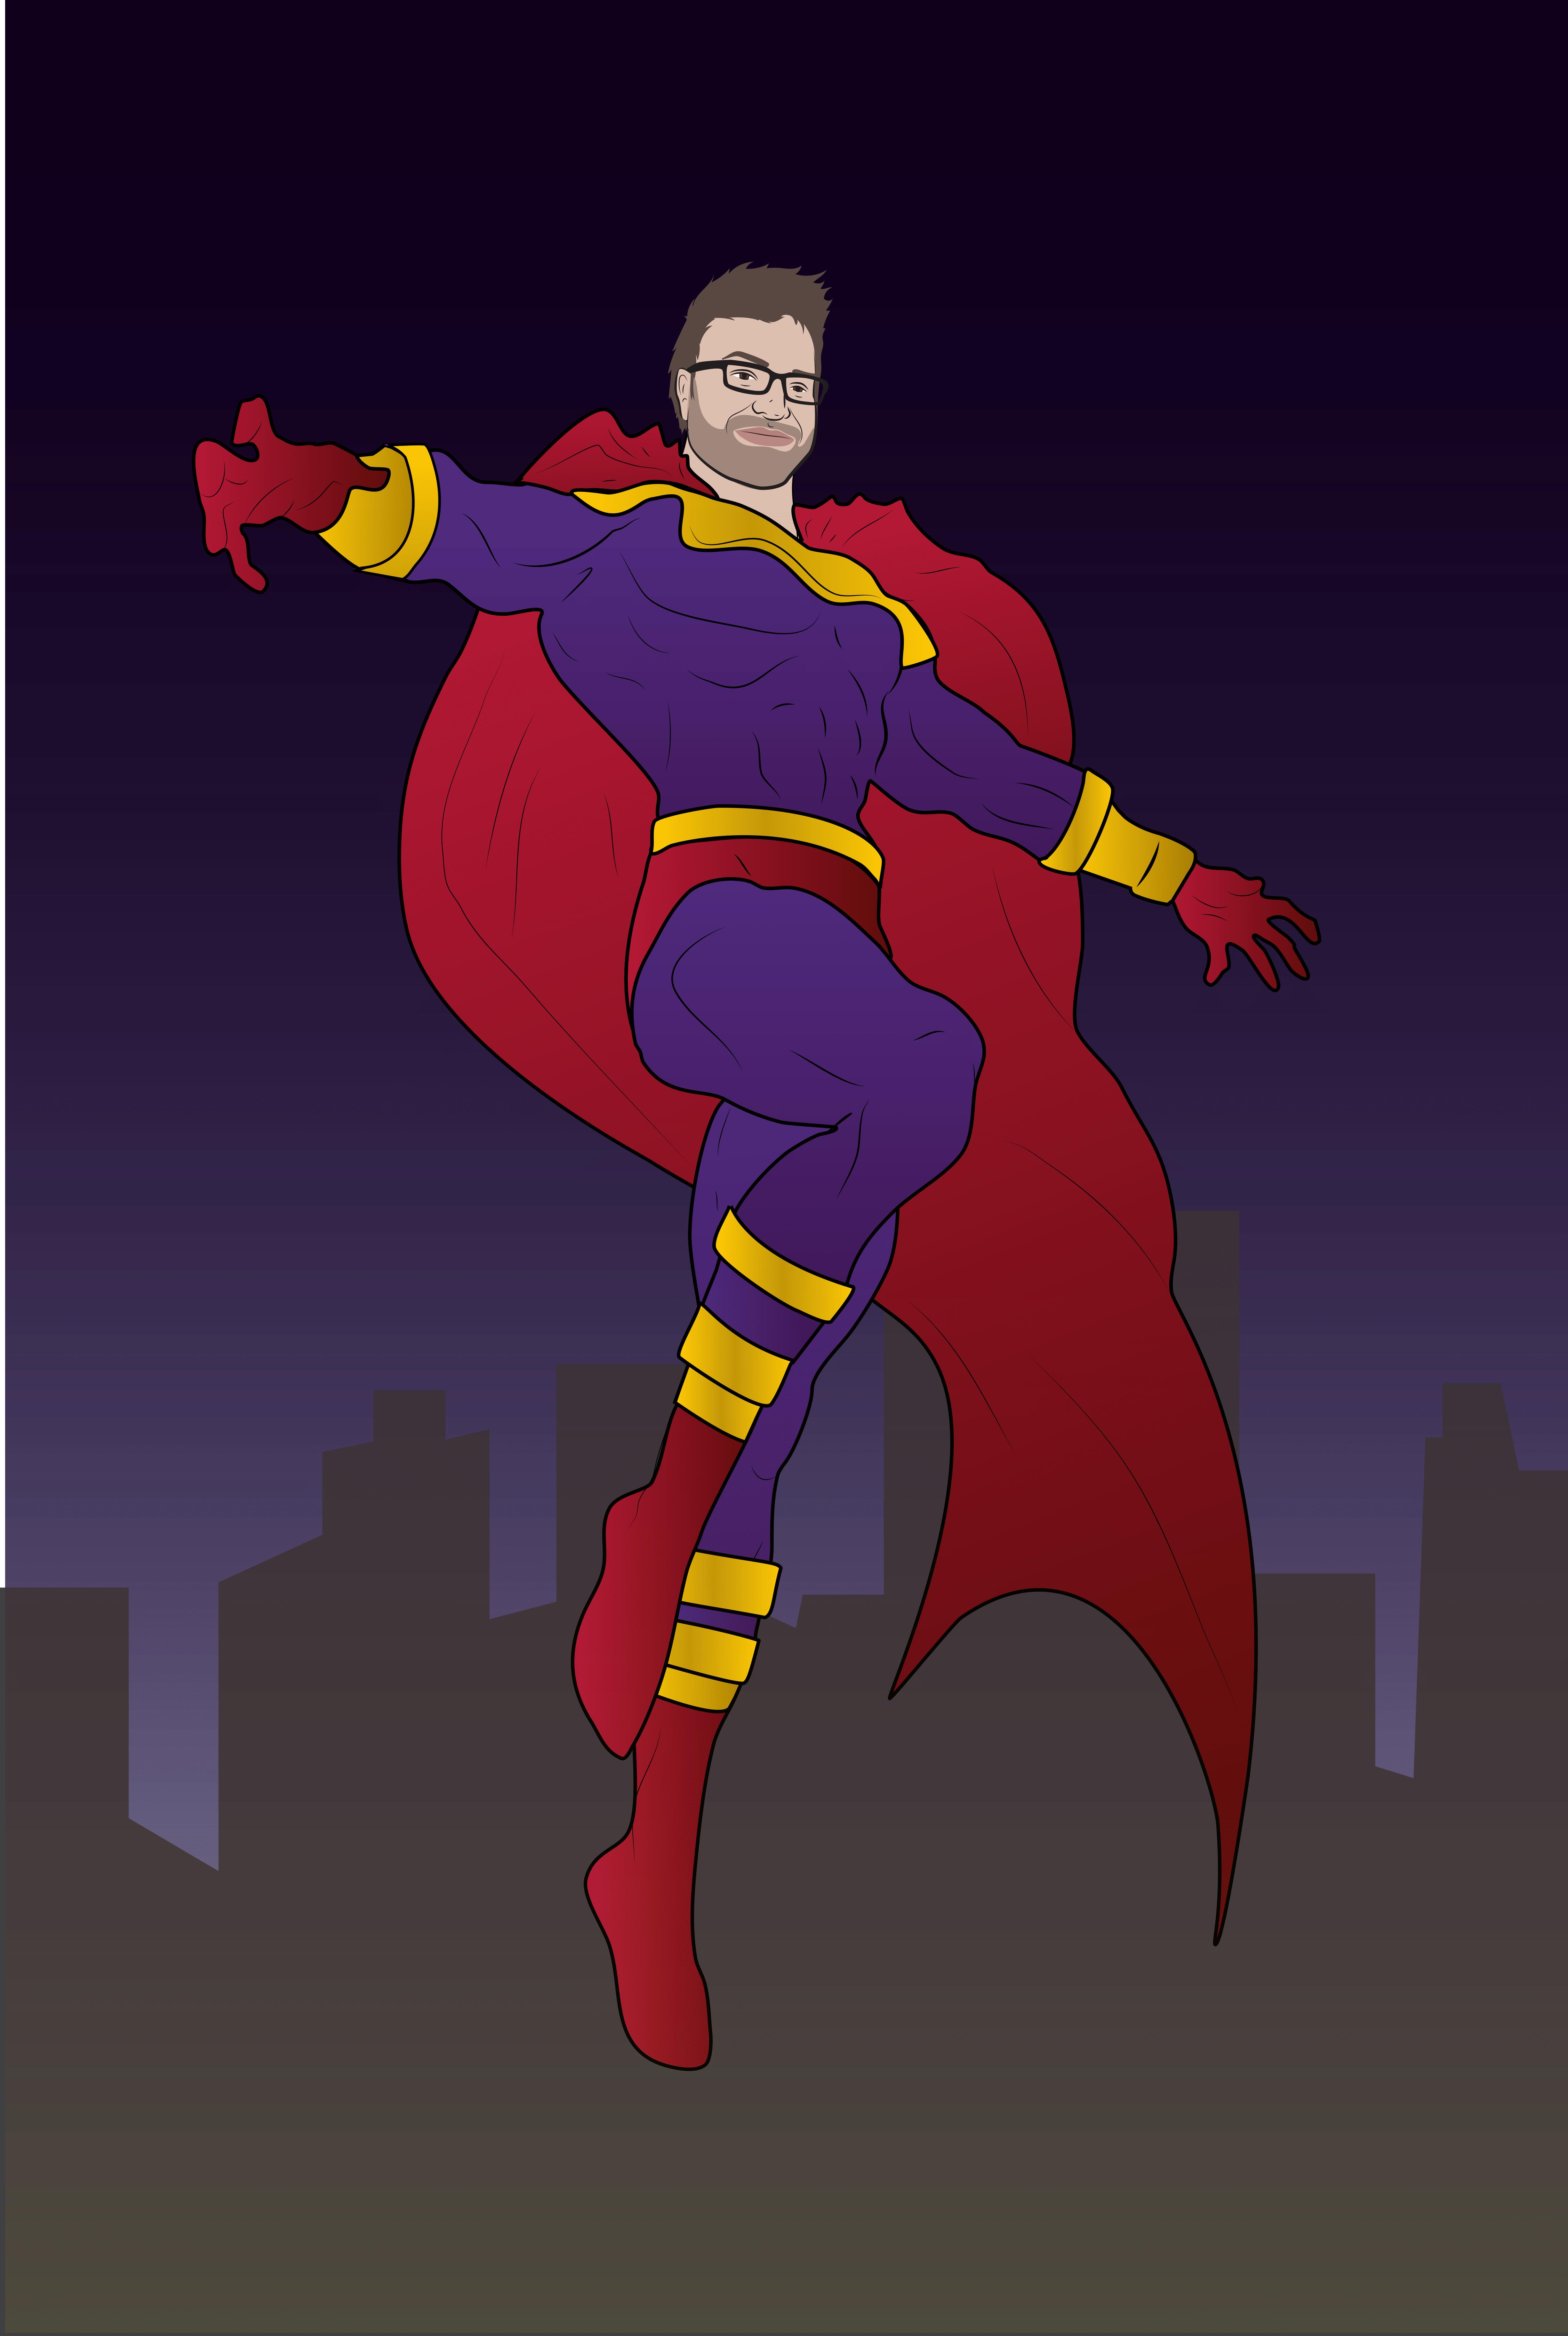 TASC_Superhero_TaylorSpeegle-1.png